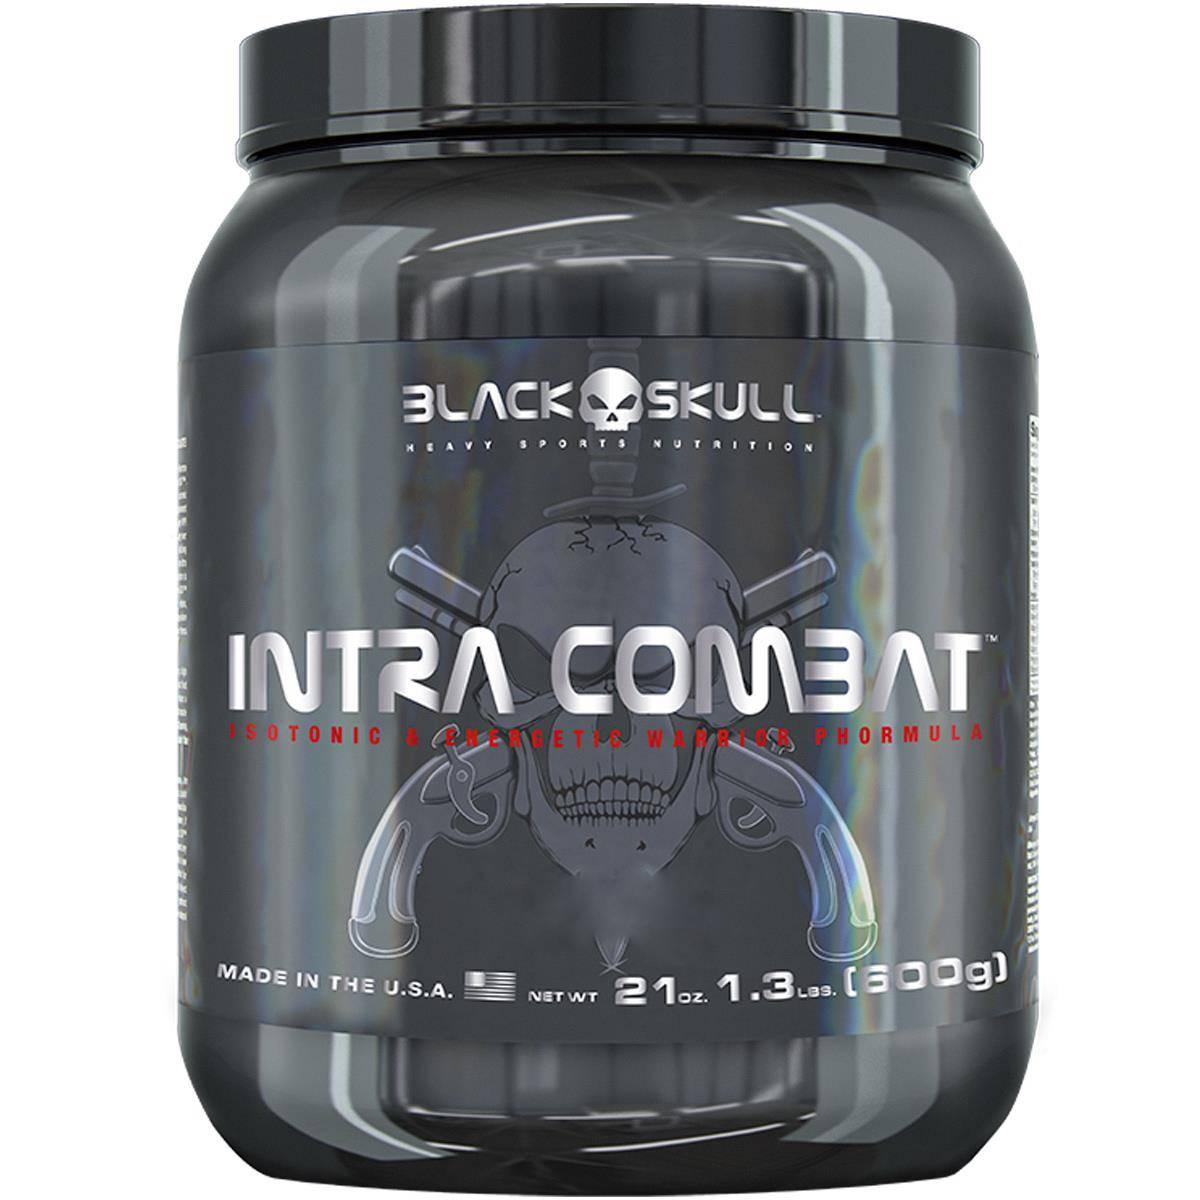 Bope Intra Combat 600 g - Black Skull